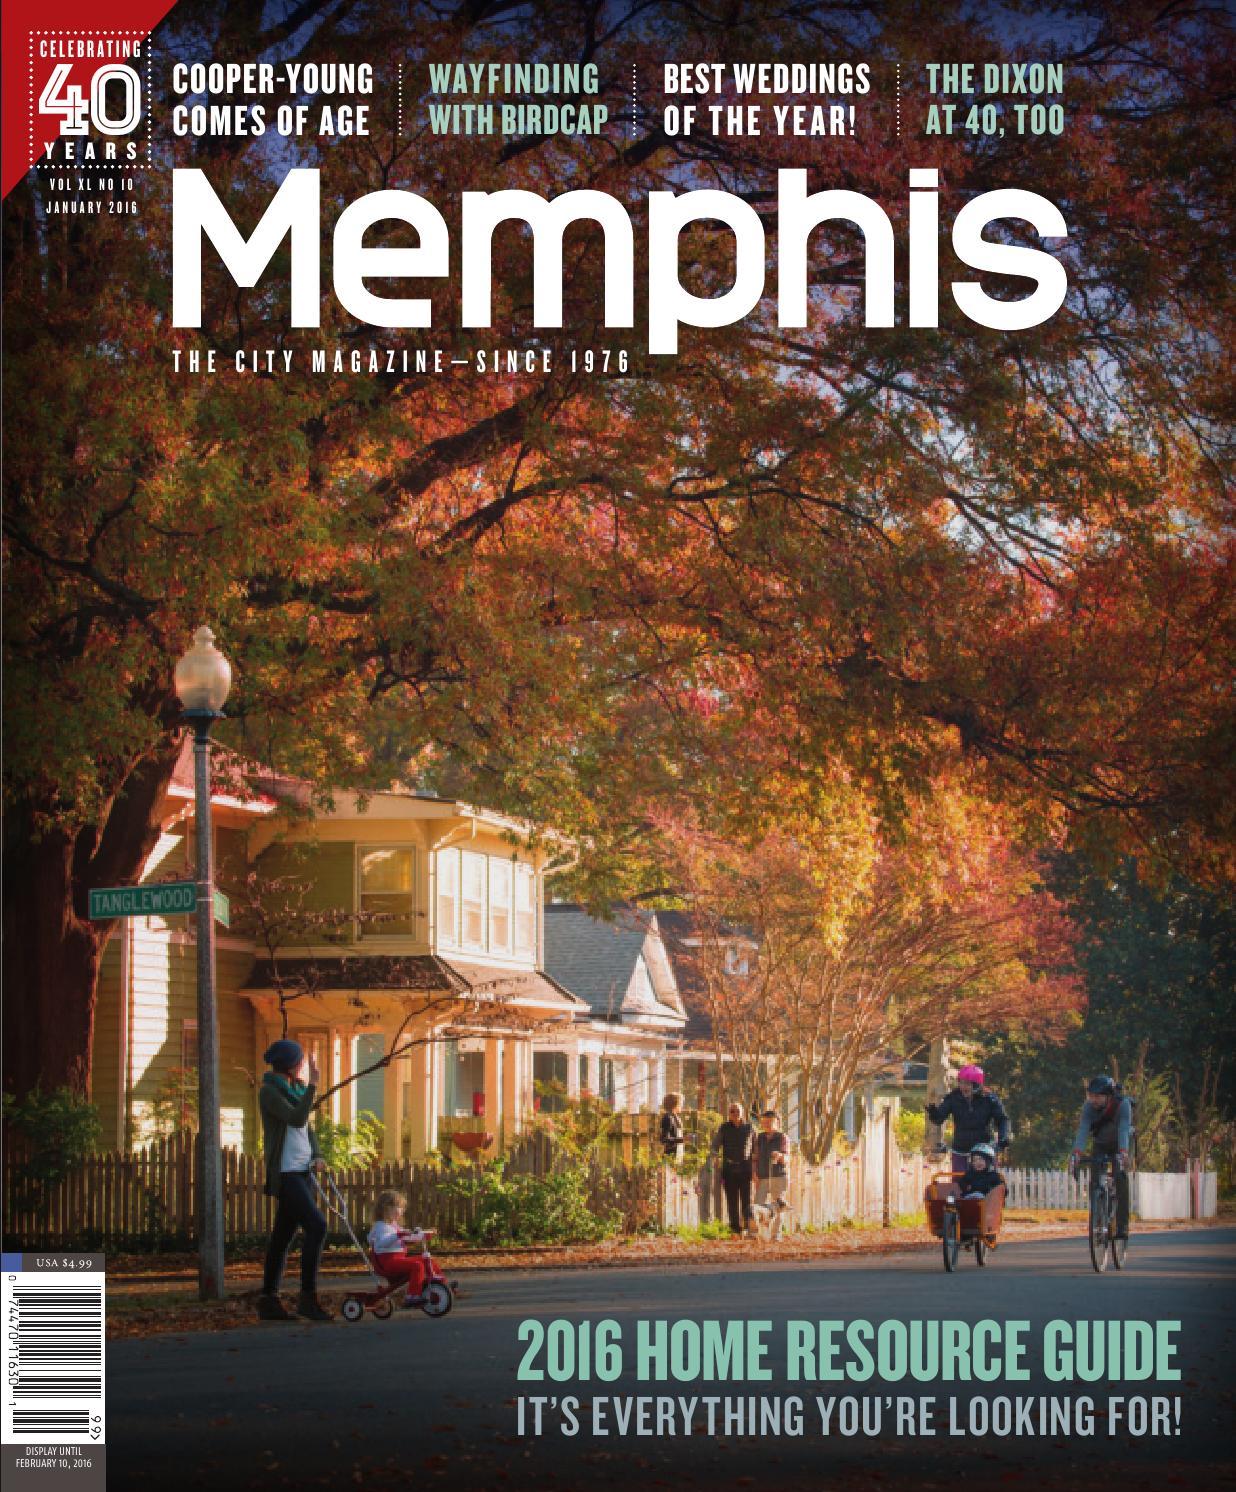 Memphis magazine, January 2016 by Contemporary Media - issuu